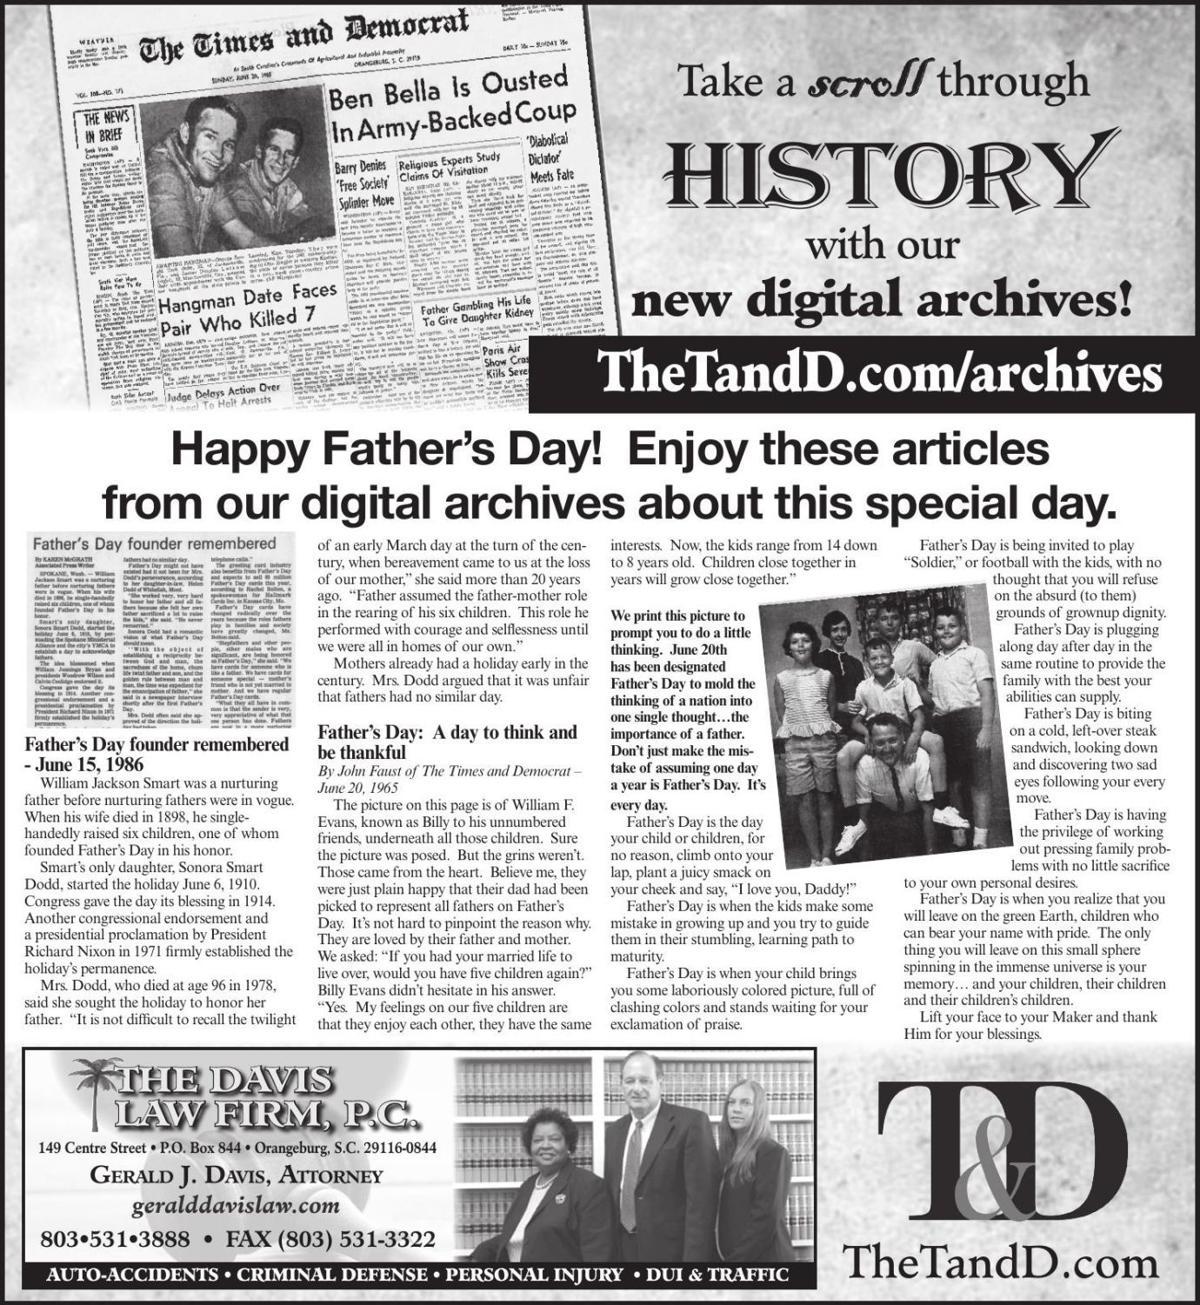 TheTandD.com/archives June 16, 2019